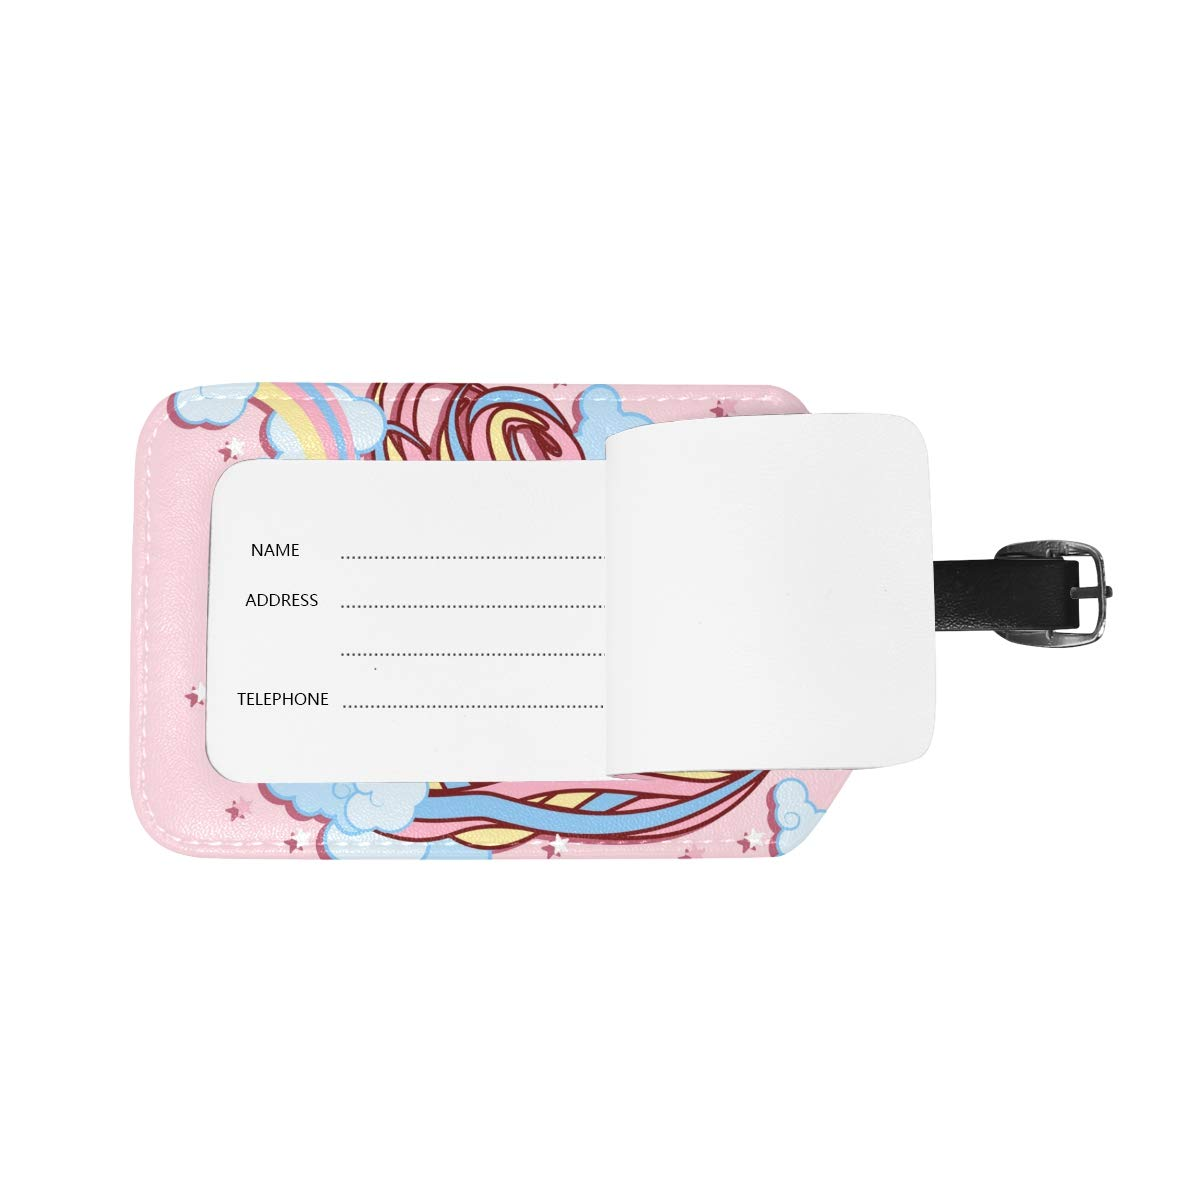 Saobao Travel Luggage Tag Pink Unicorn PU Leather Baggage Travel ID